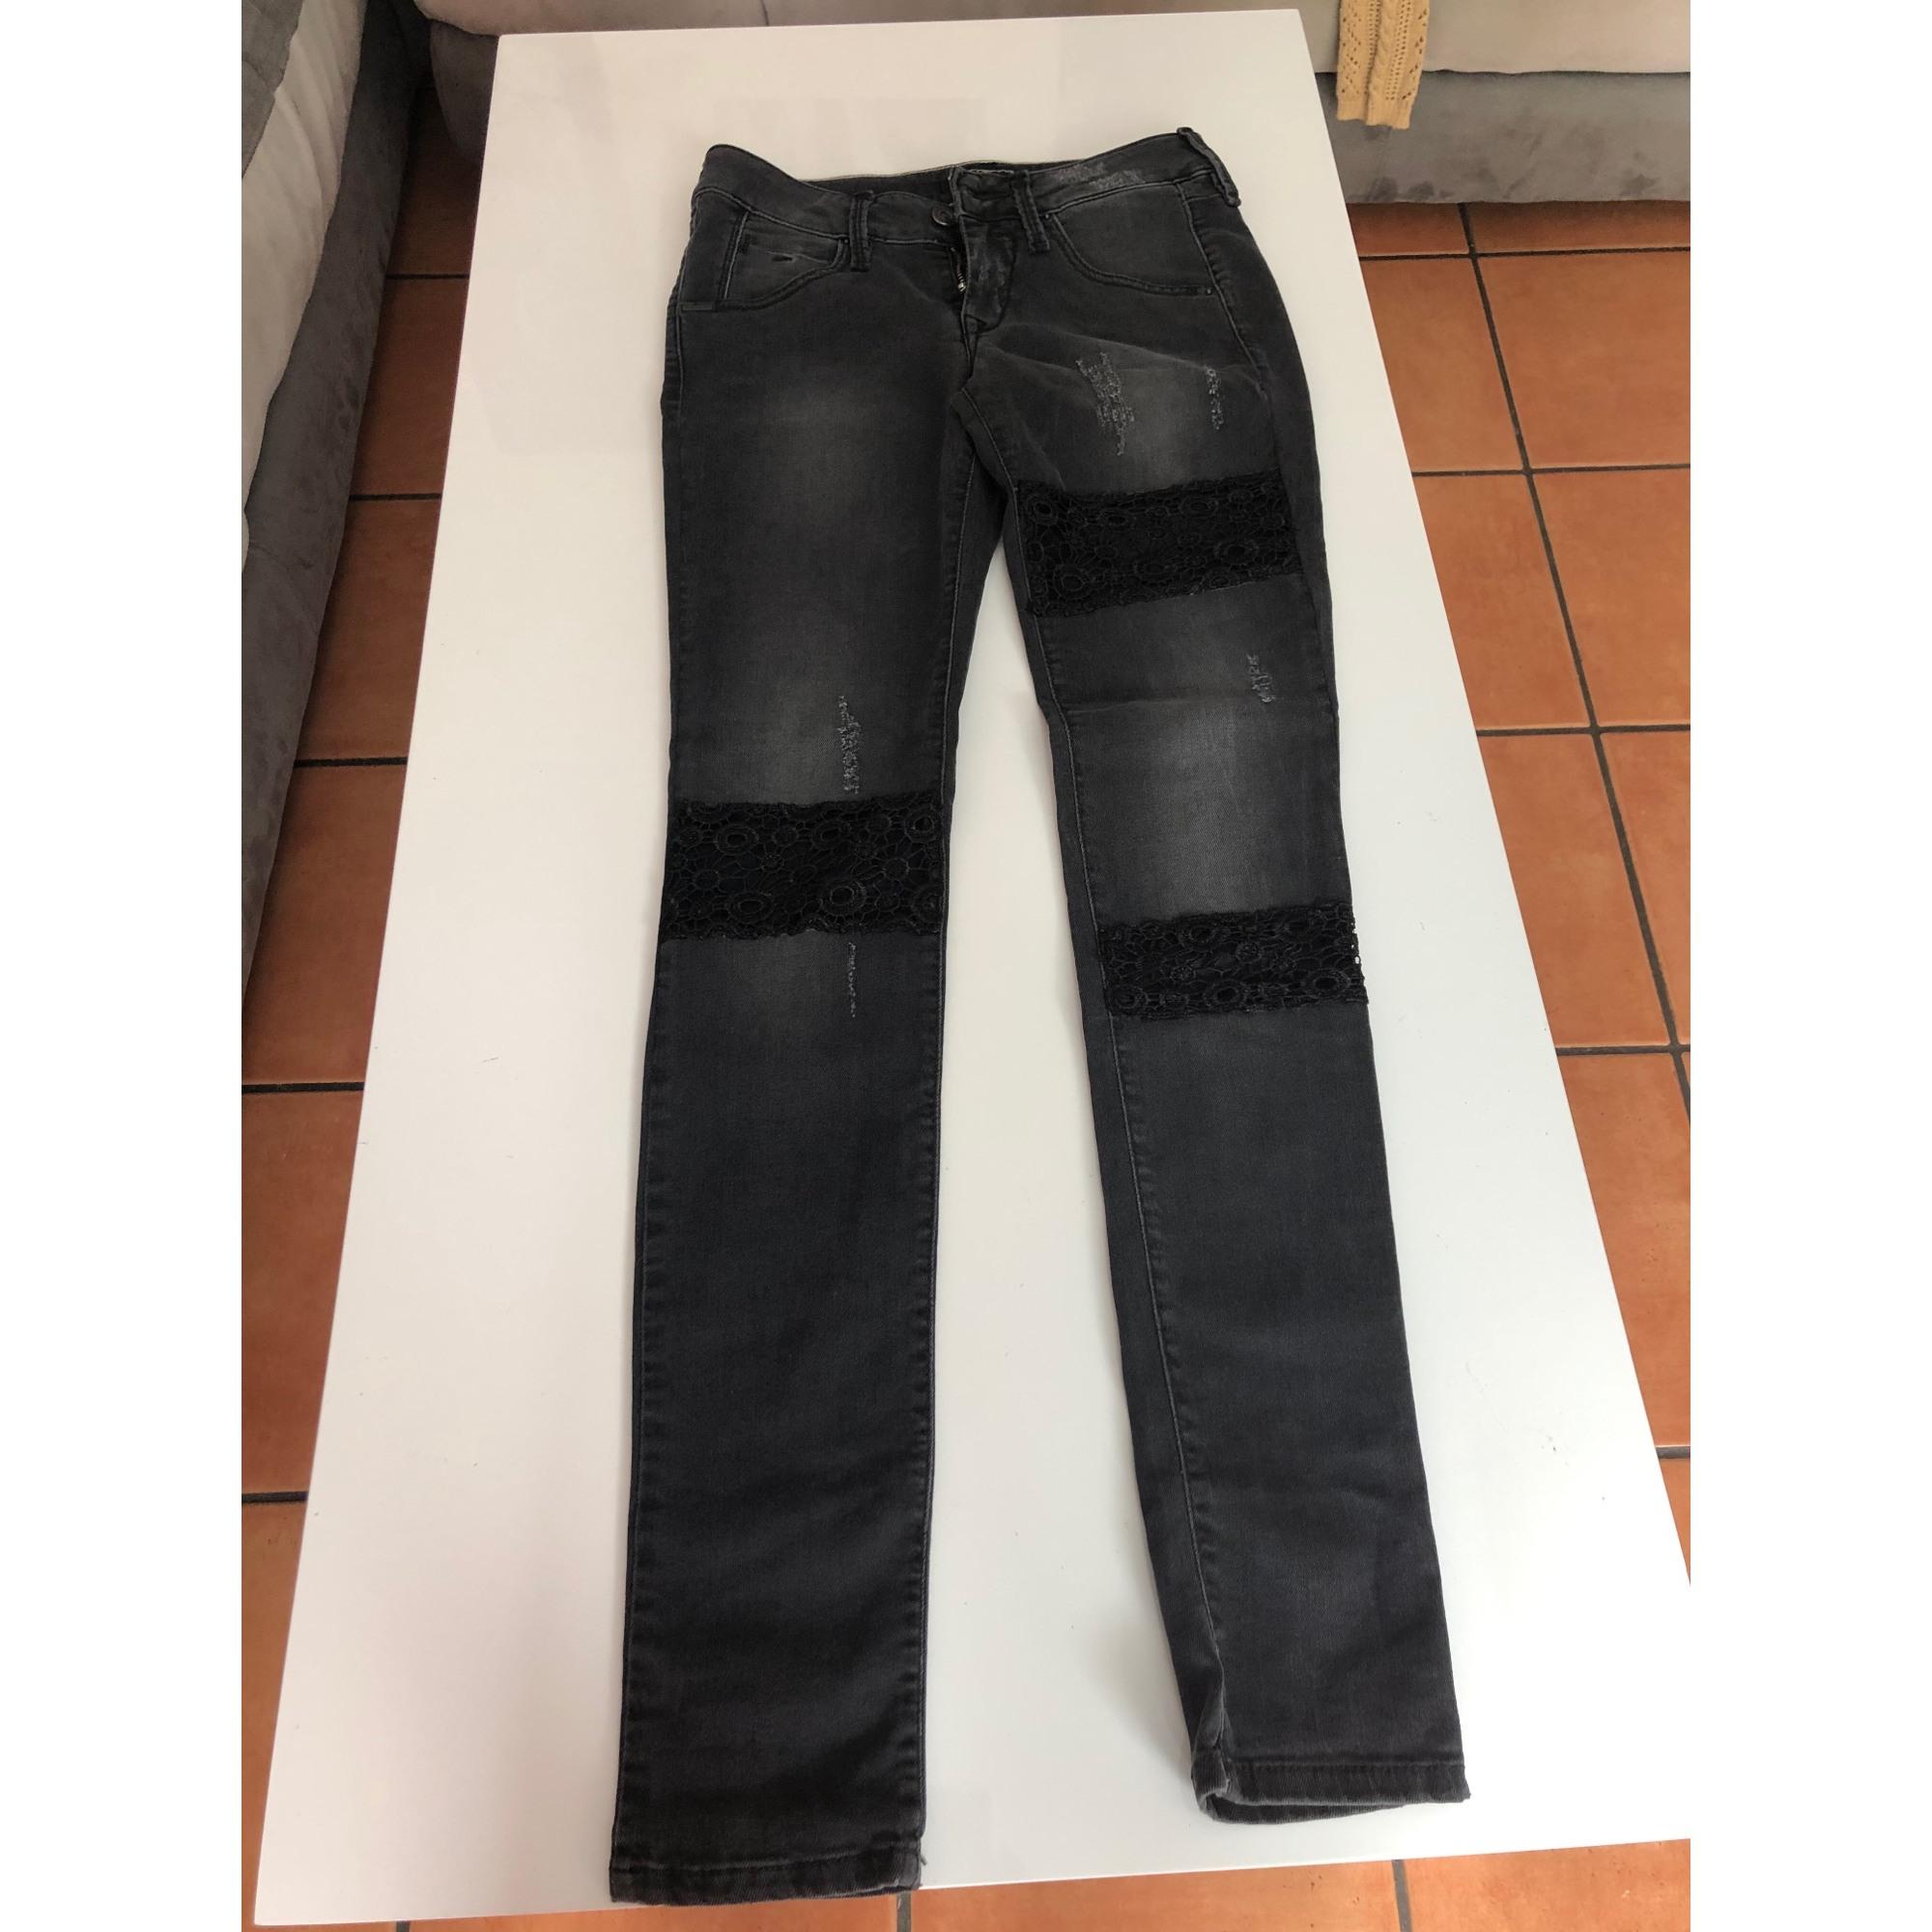 Jeans slim FORNARINA Gris, anthracite